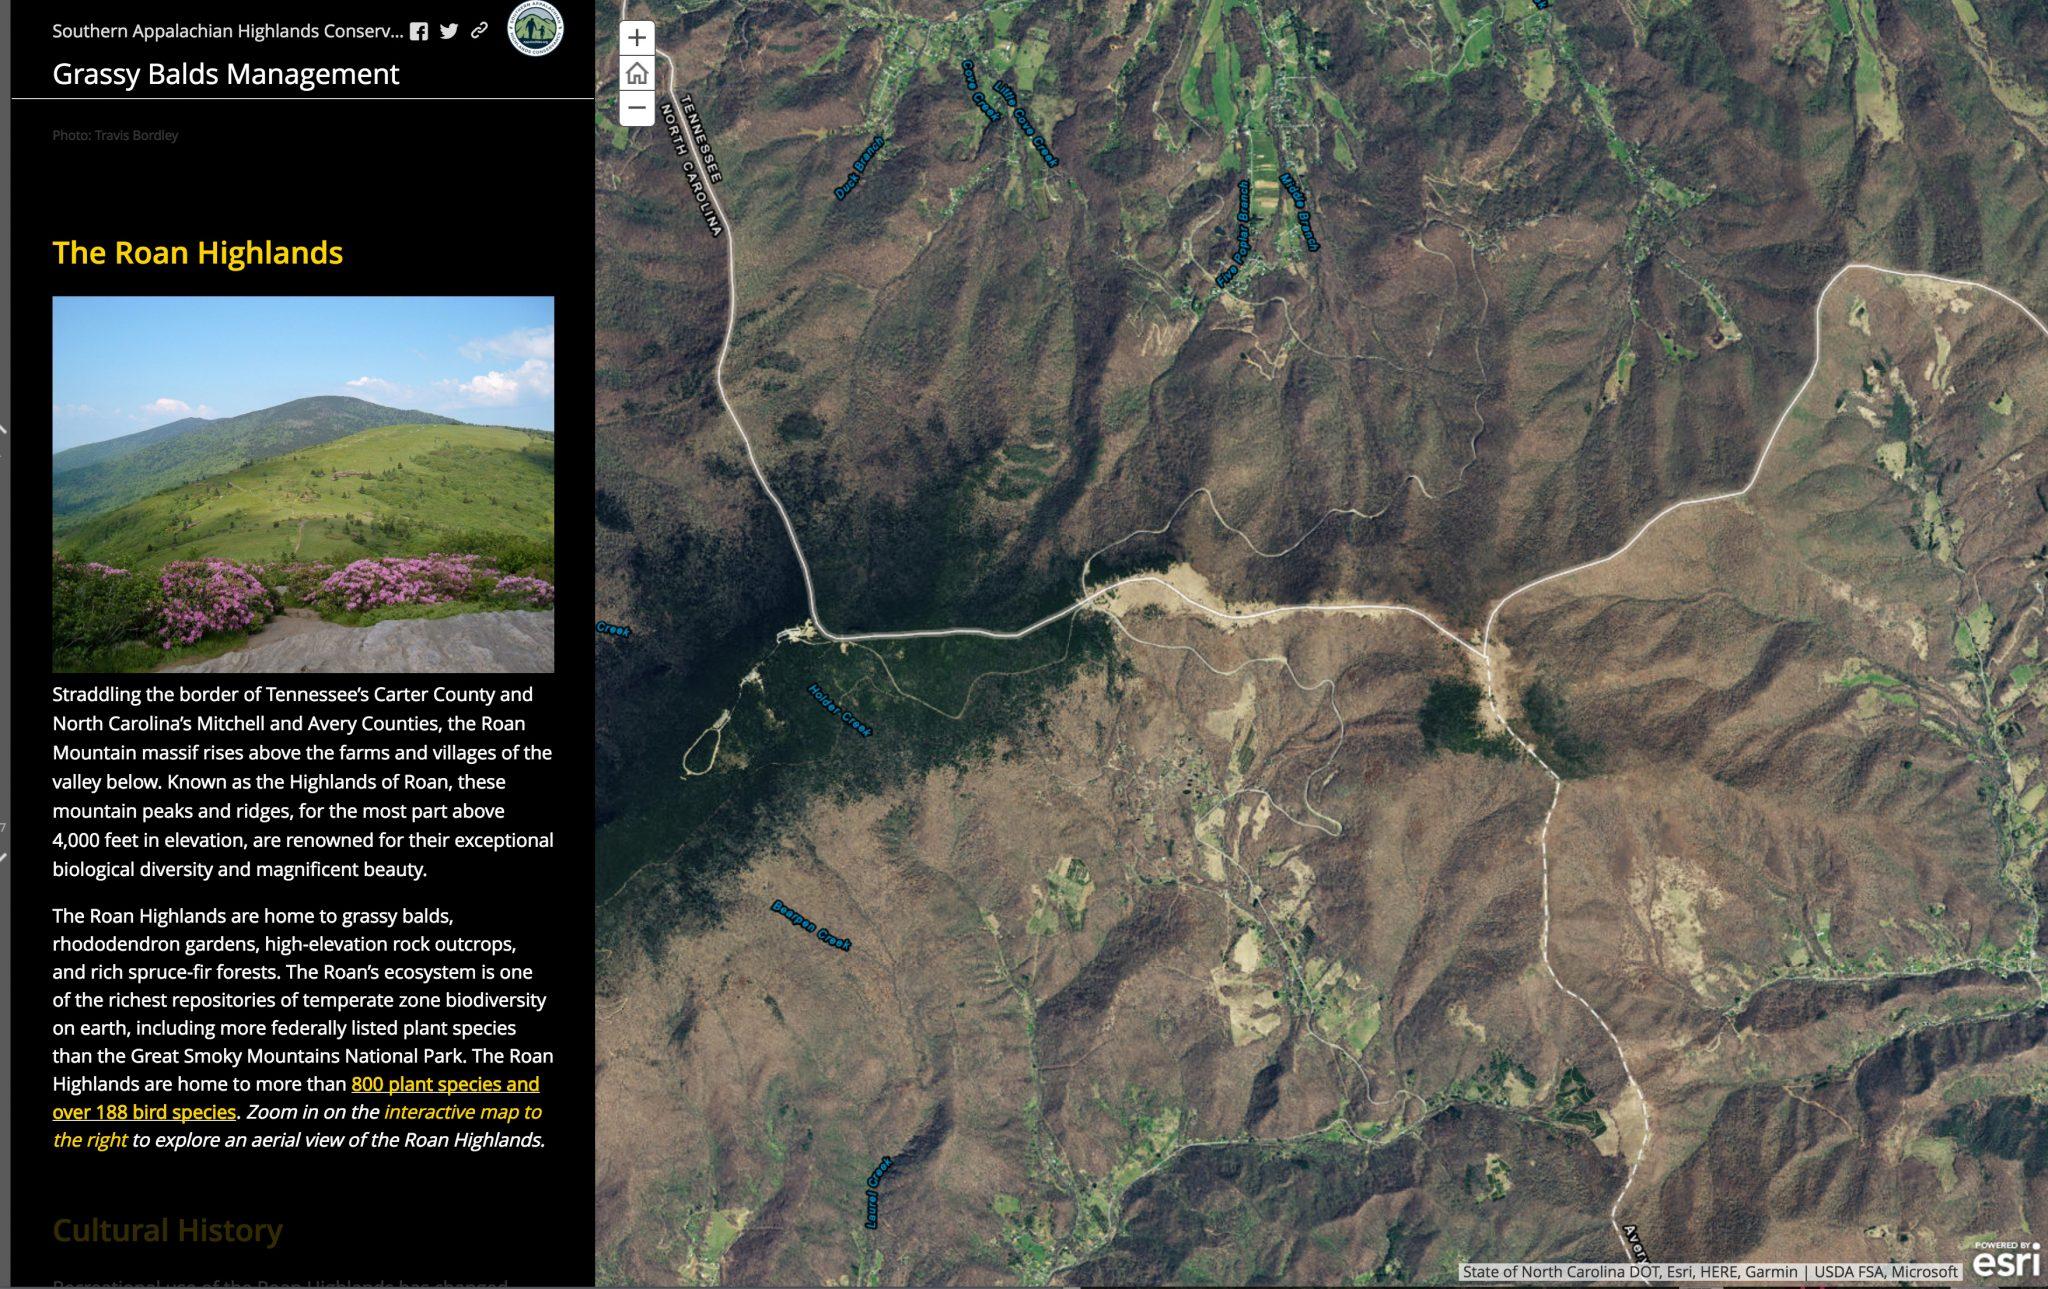 Roan Highlands Story Map - Southern Appalachian Highlands